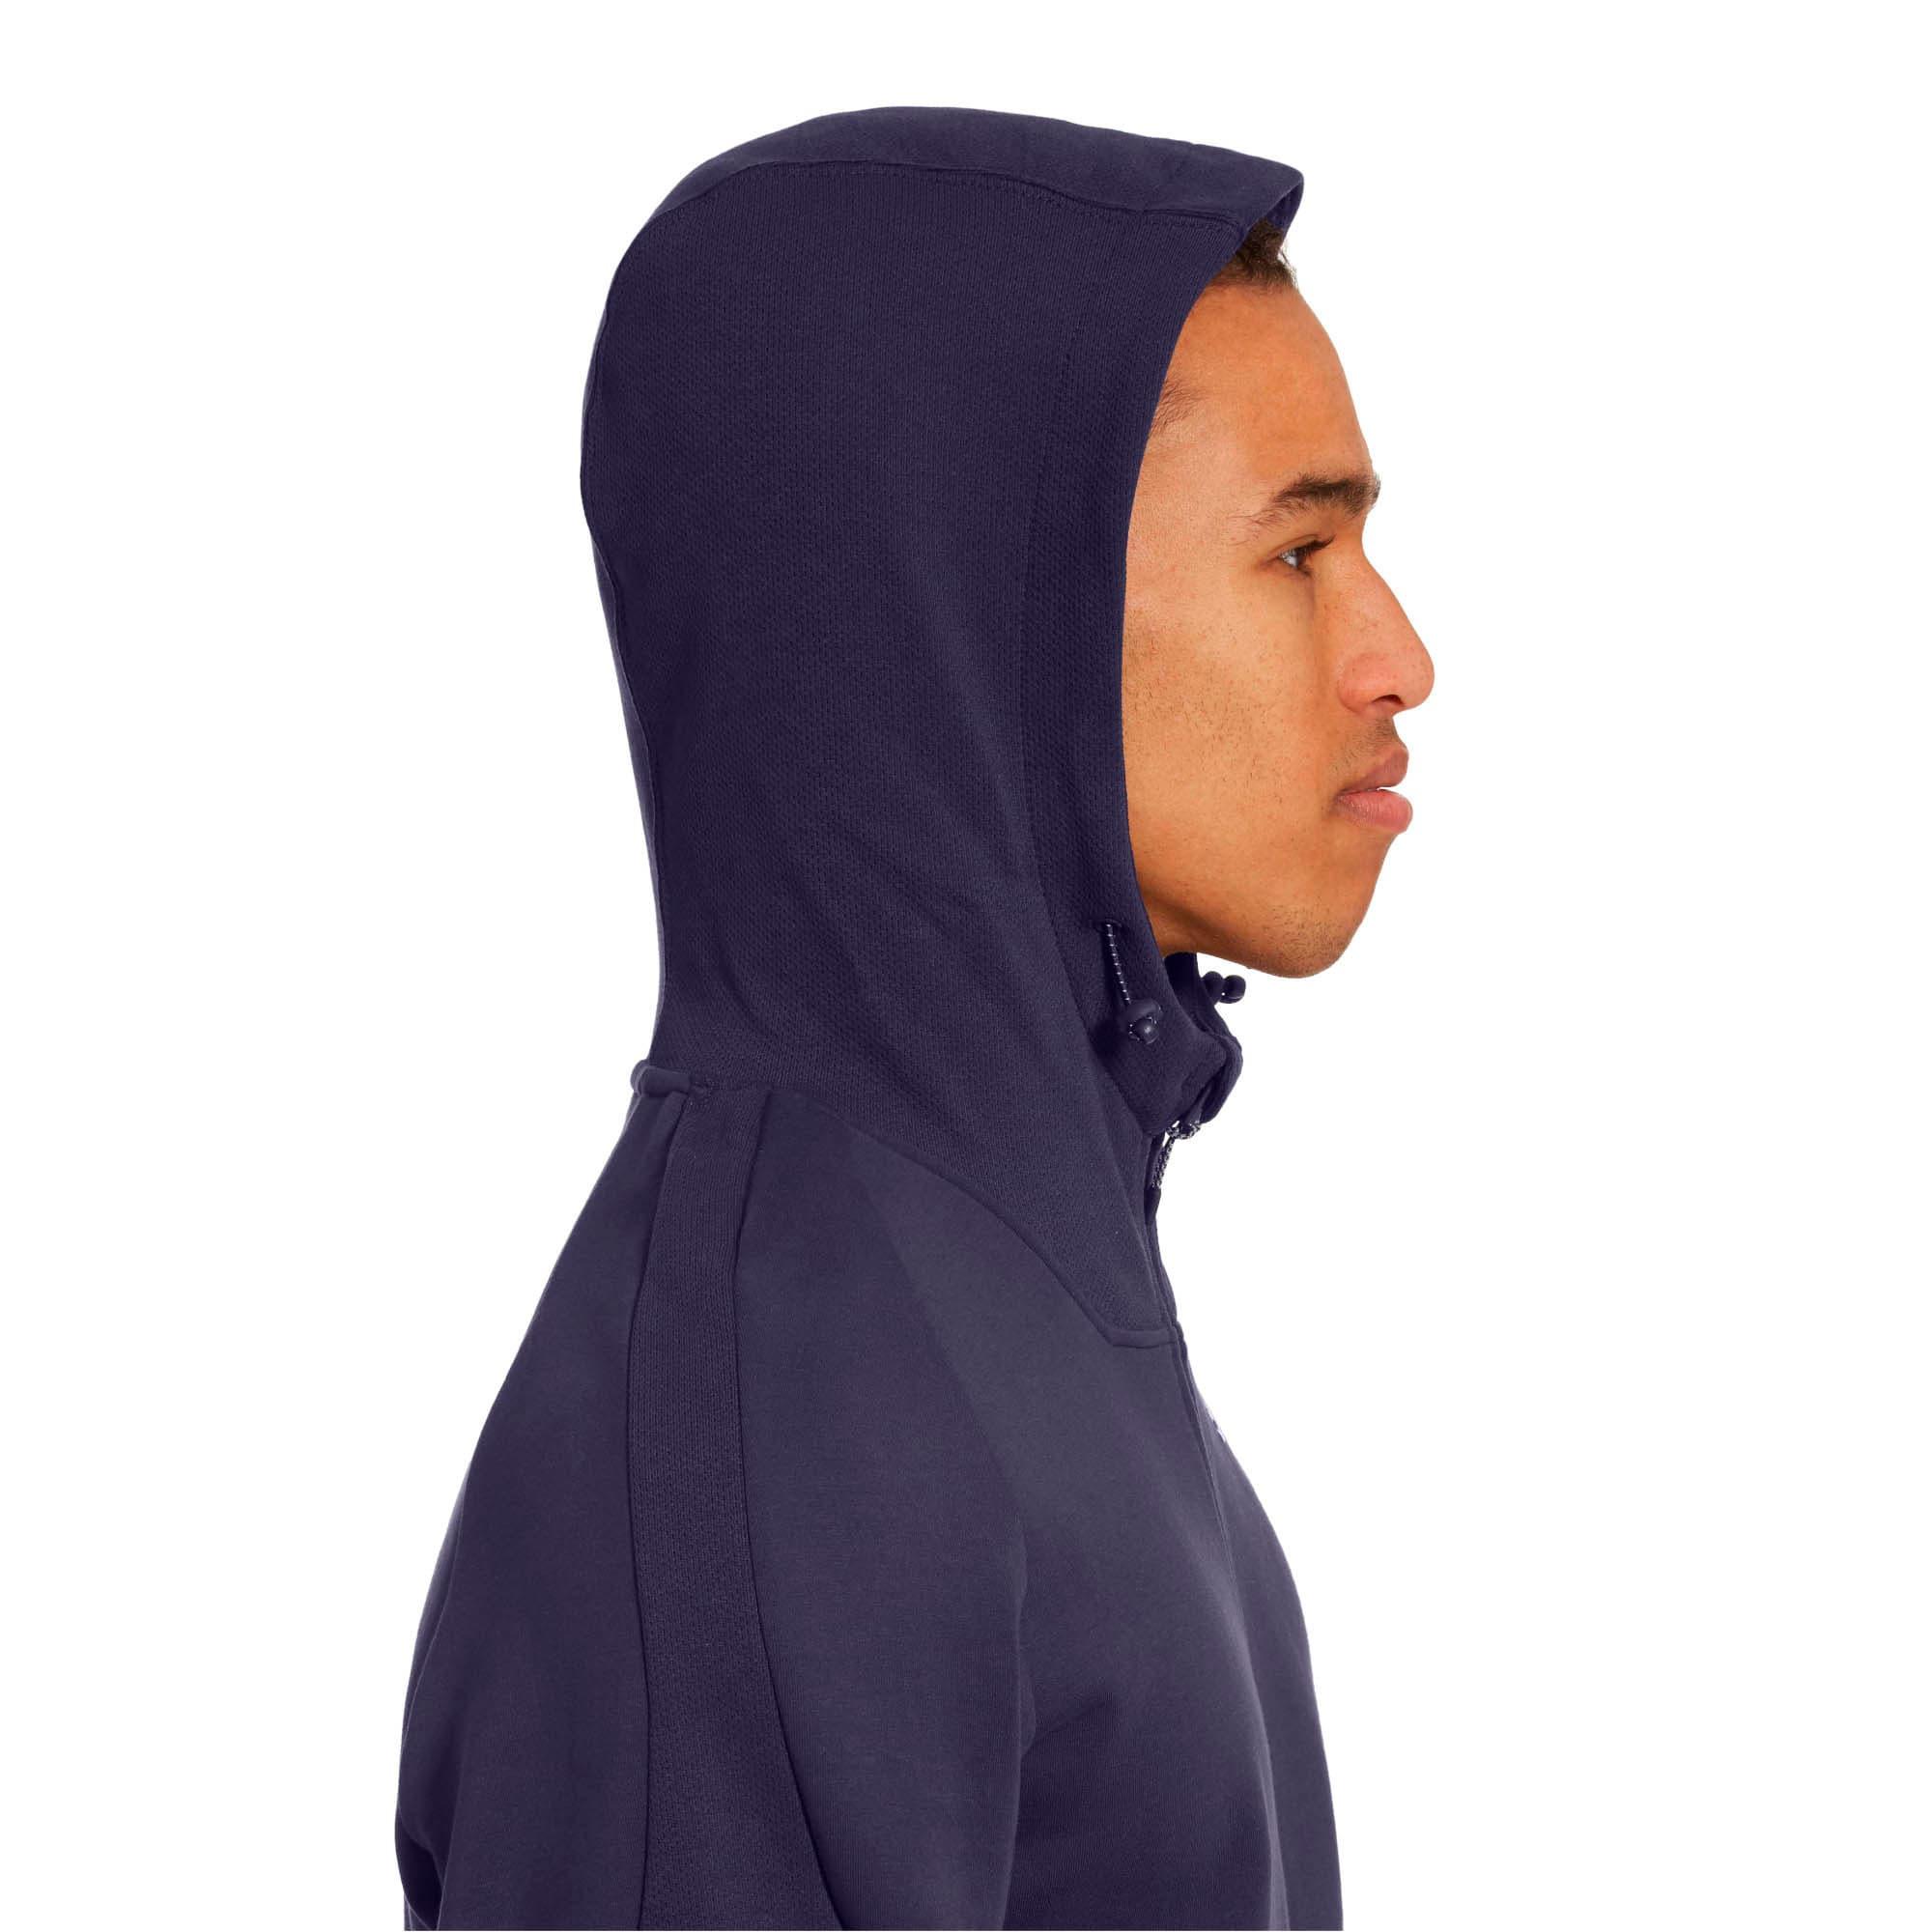 Thumbnail 4 of Evostripe Move Hooded Jacket, Peacoat, medium